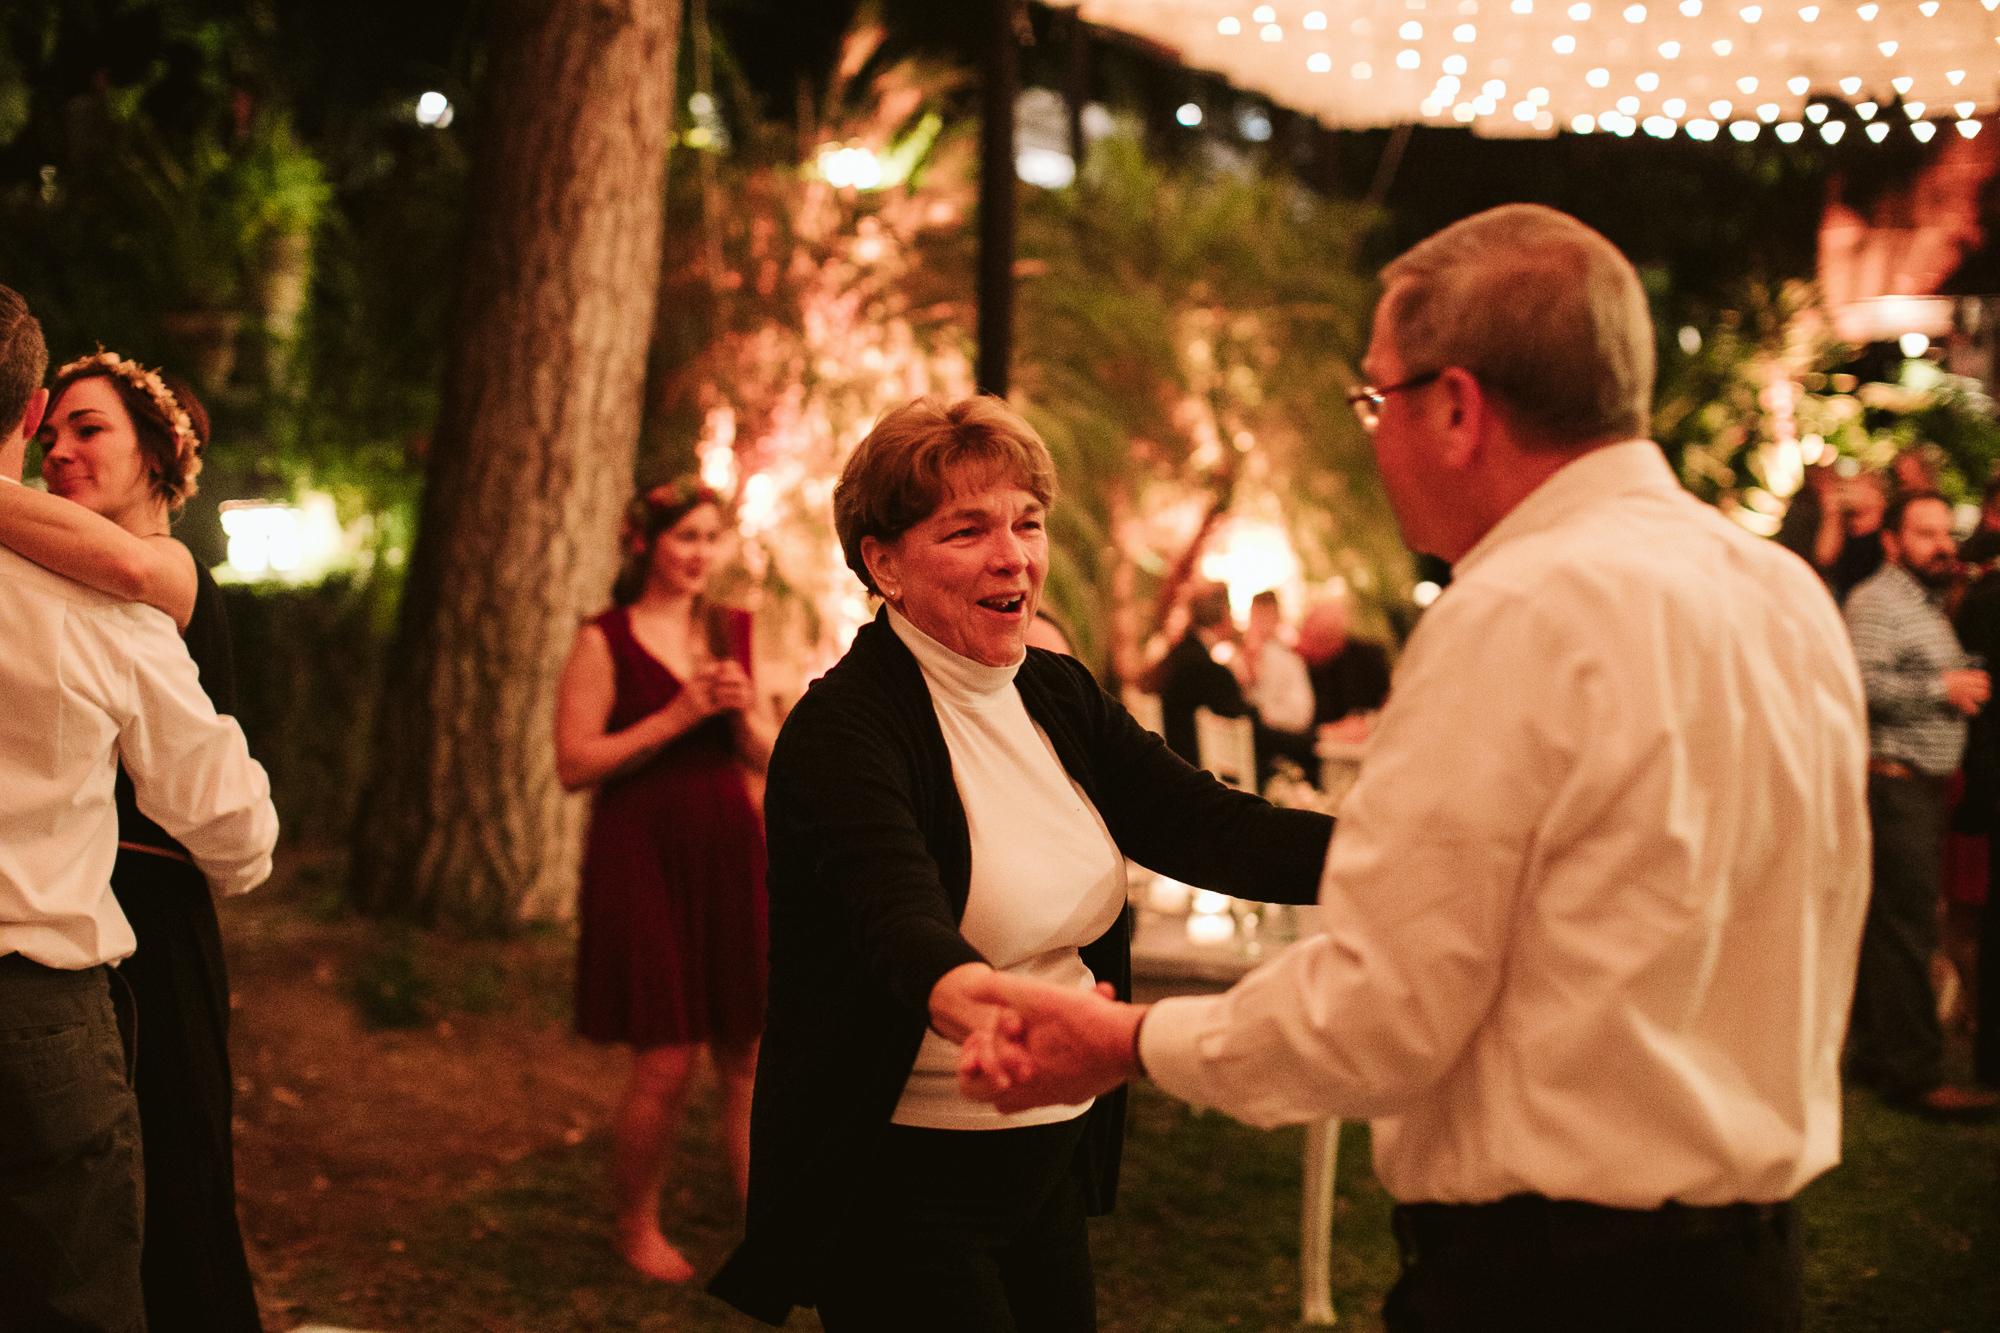 Destination-wedding-photographer-219.jpg